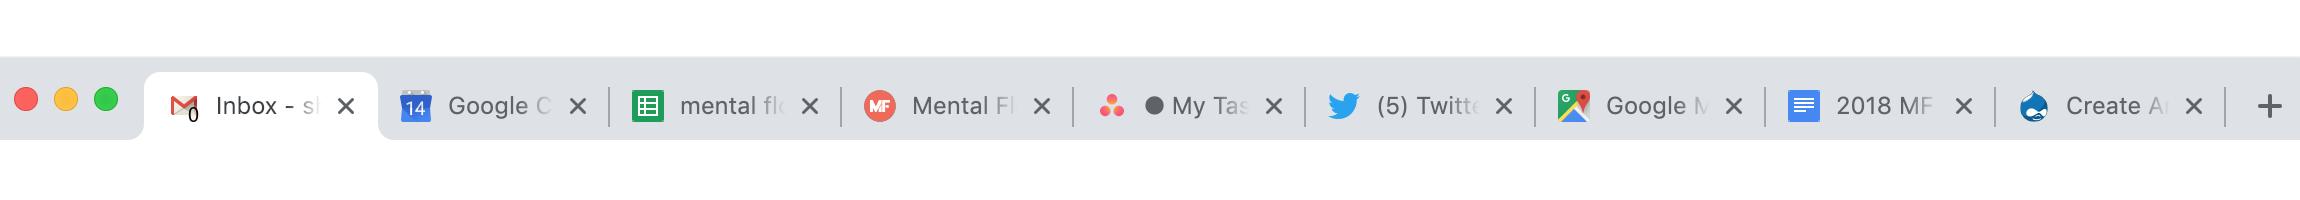 Nine open tabs on a desktop browser